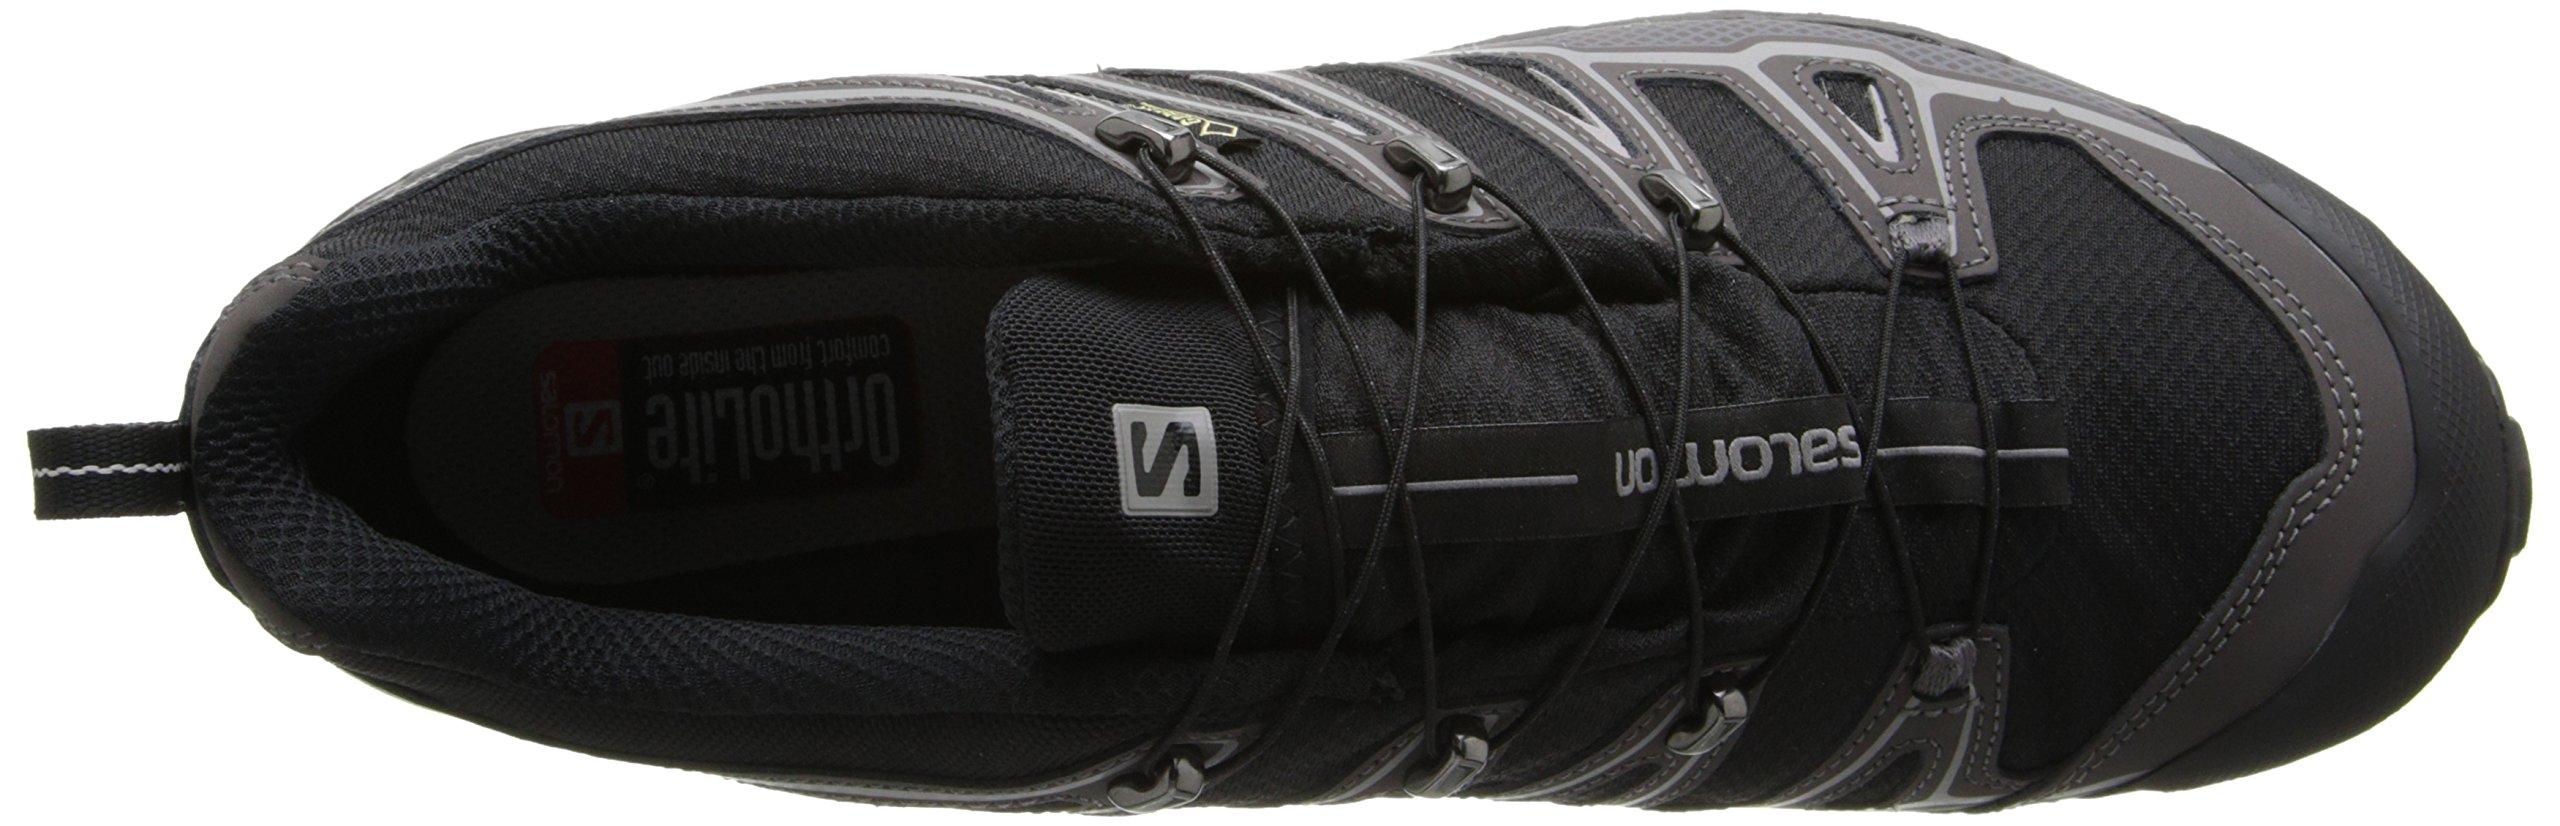 Salomon Men's X Ultra 2 GTX Hiking Shoe, Black/Autobahn/Aluminum, 7 M US by Salomon (Image #8)